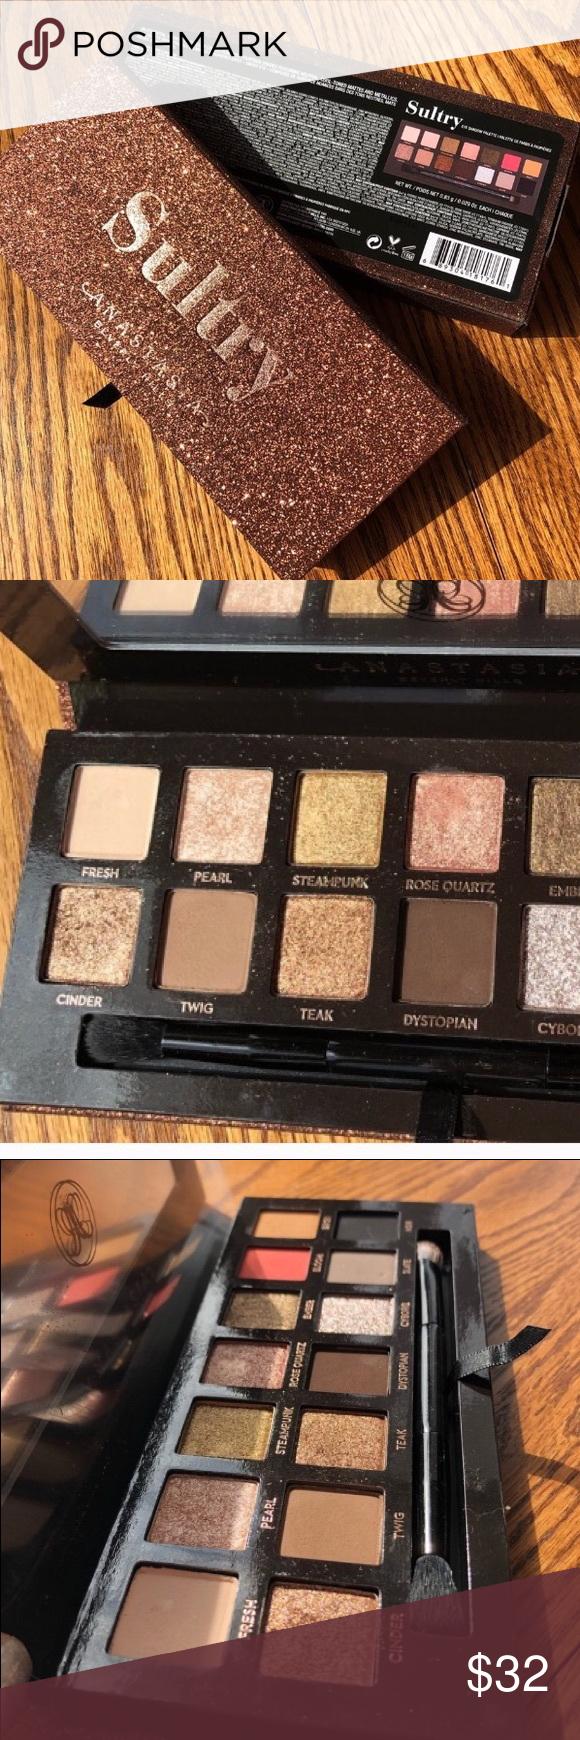 My ISO ️   Sephora makeup, Sephora tan